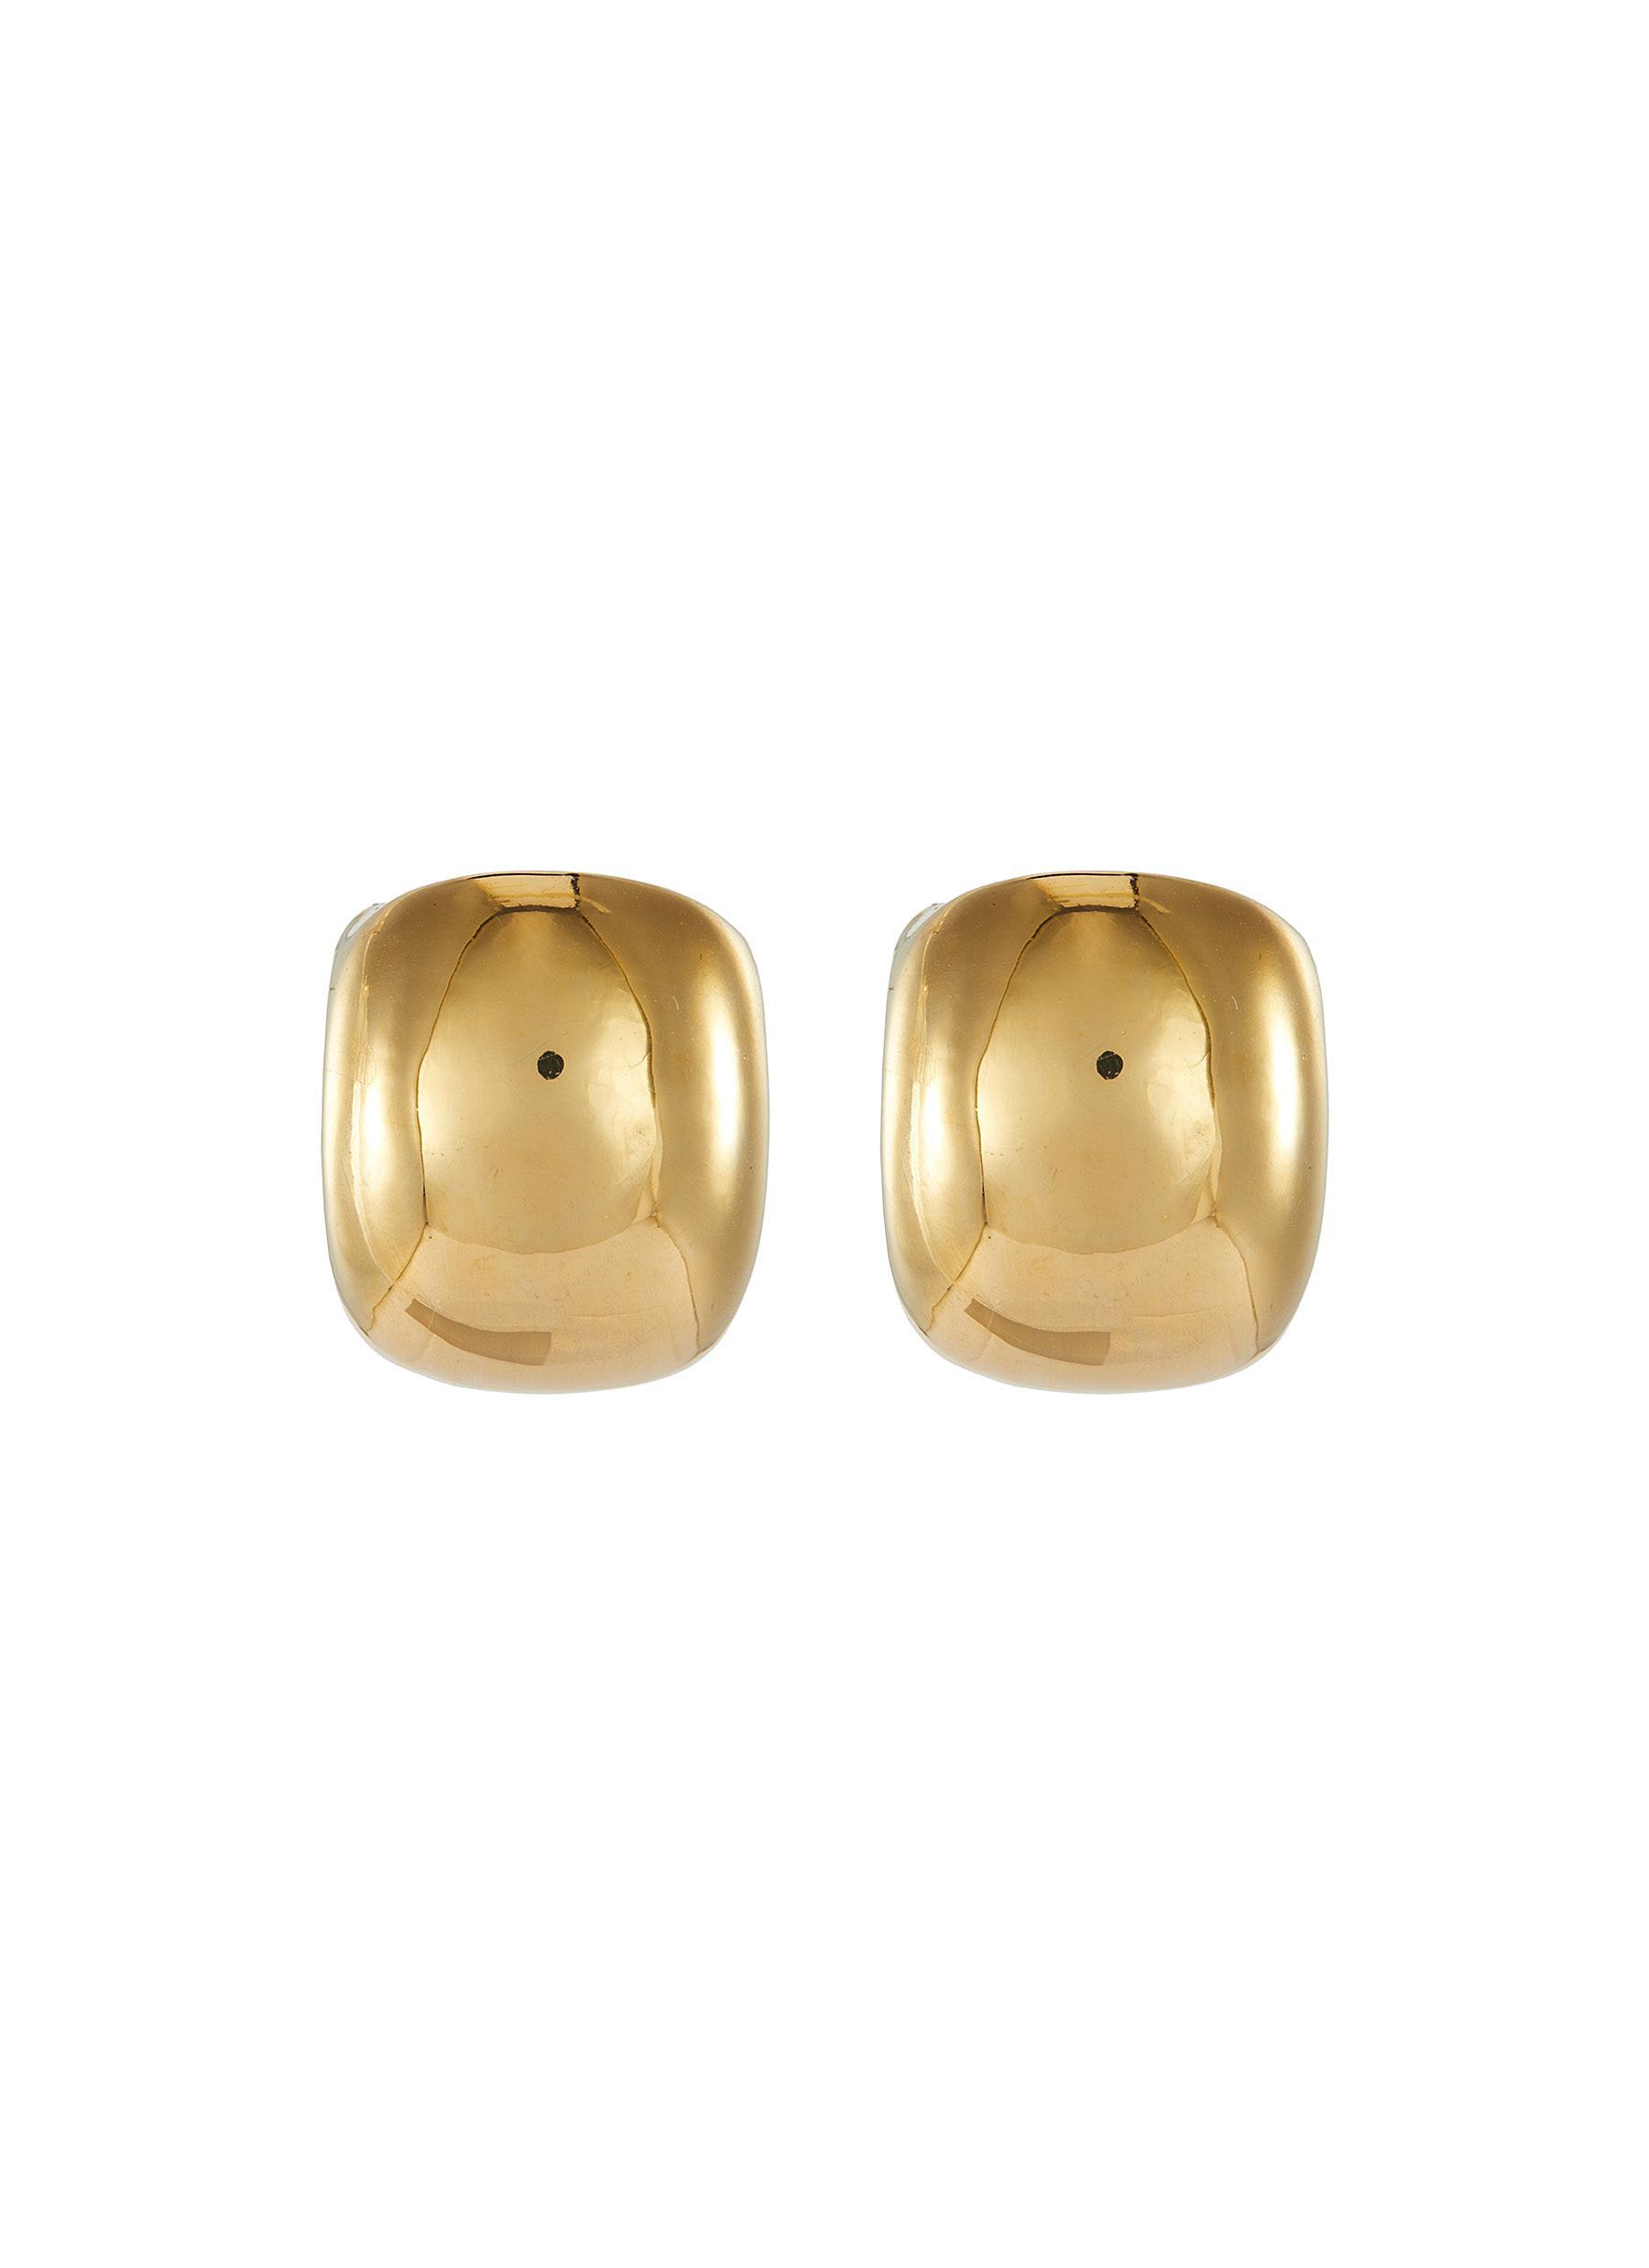 Pebble' gold plated stud earrings